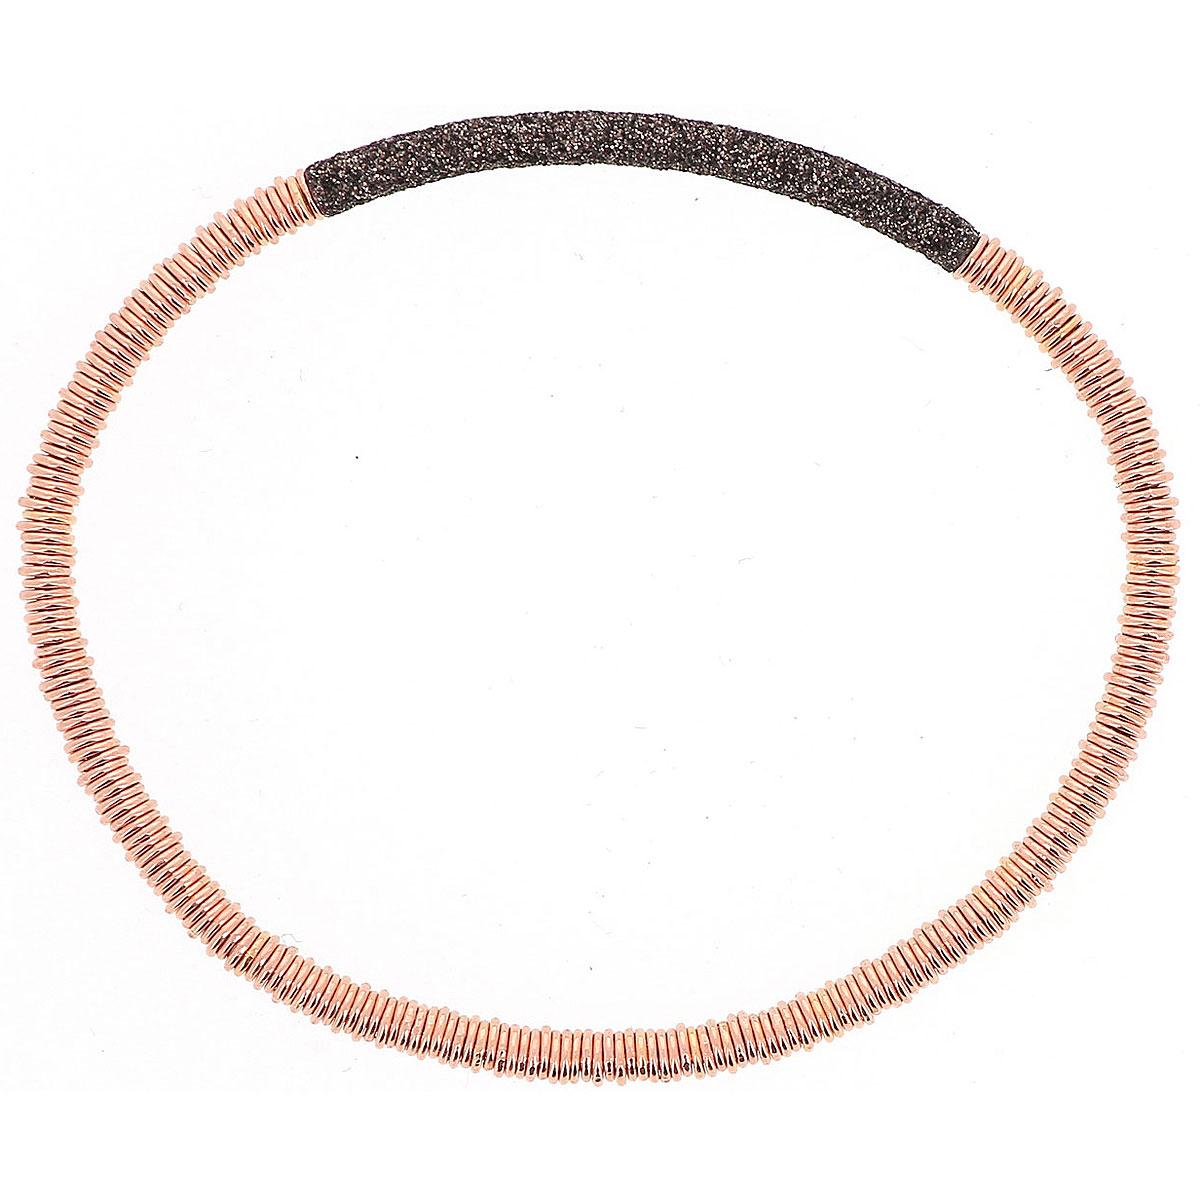 Pesavento Bracelet for Women, Rose Gold, Silver, 2019